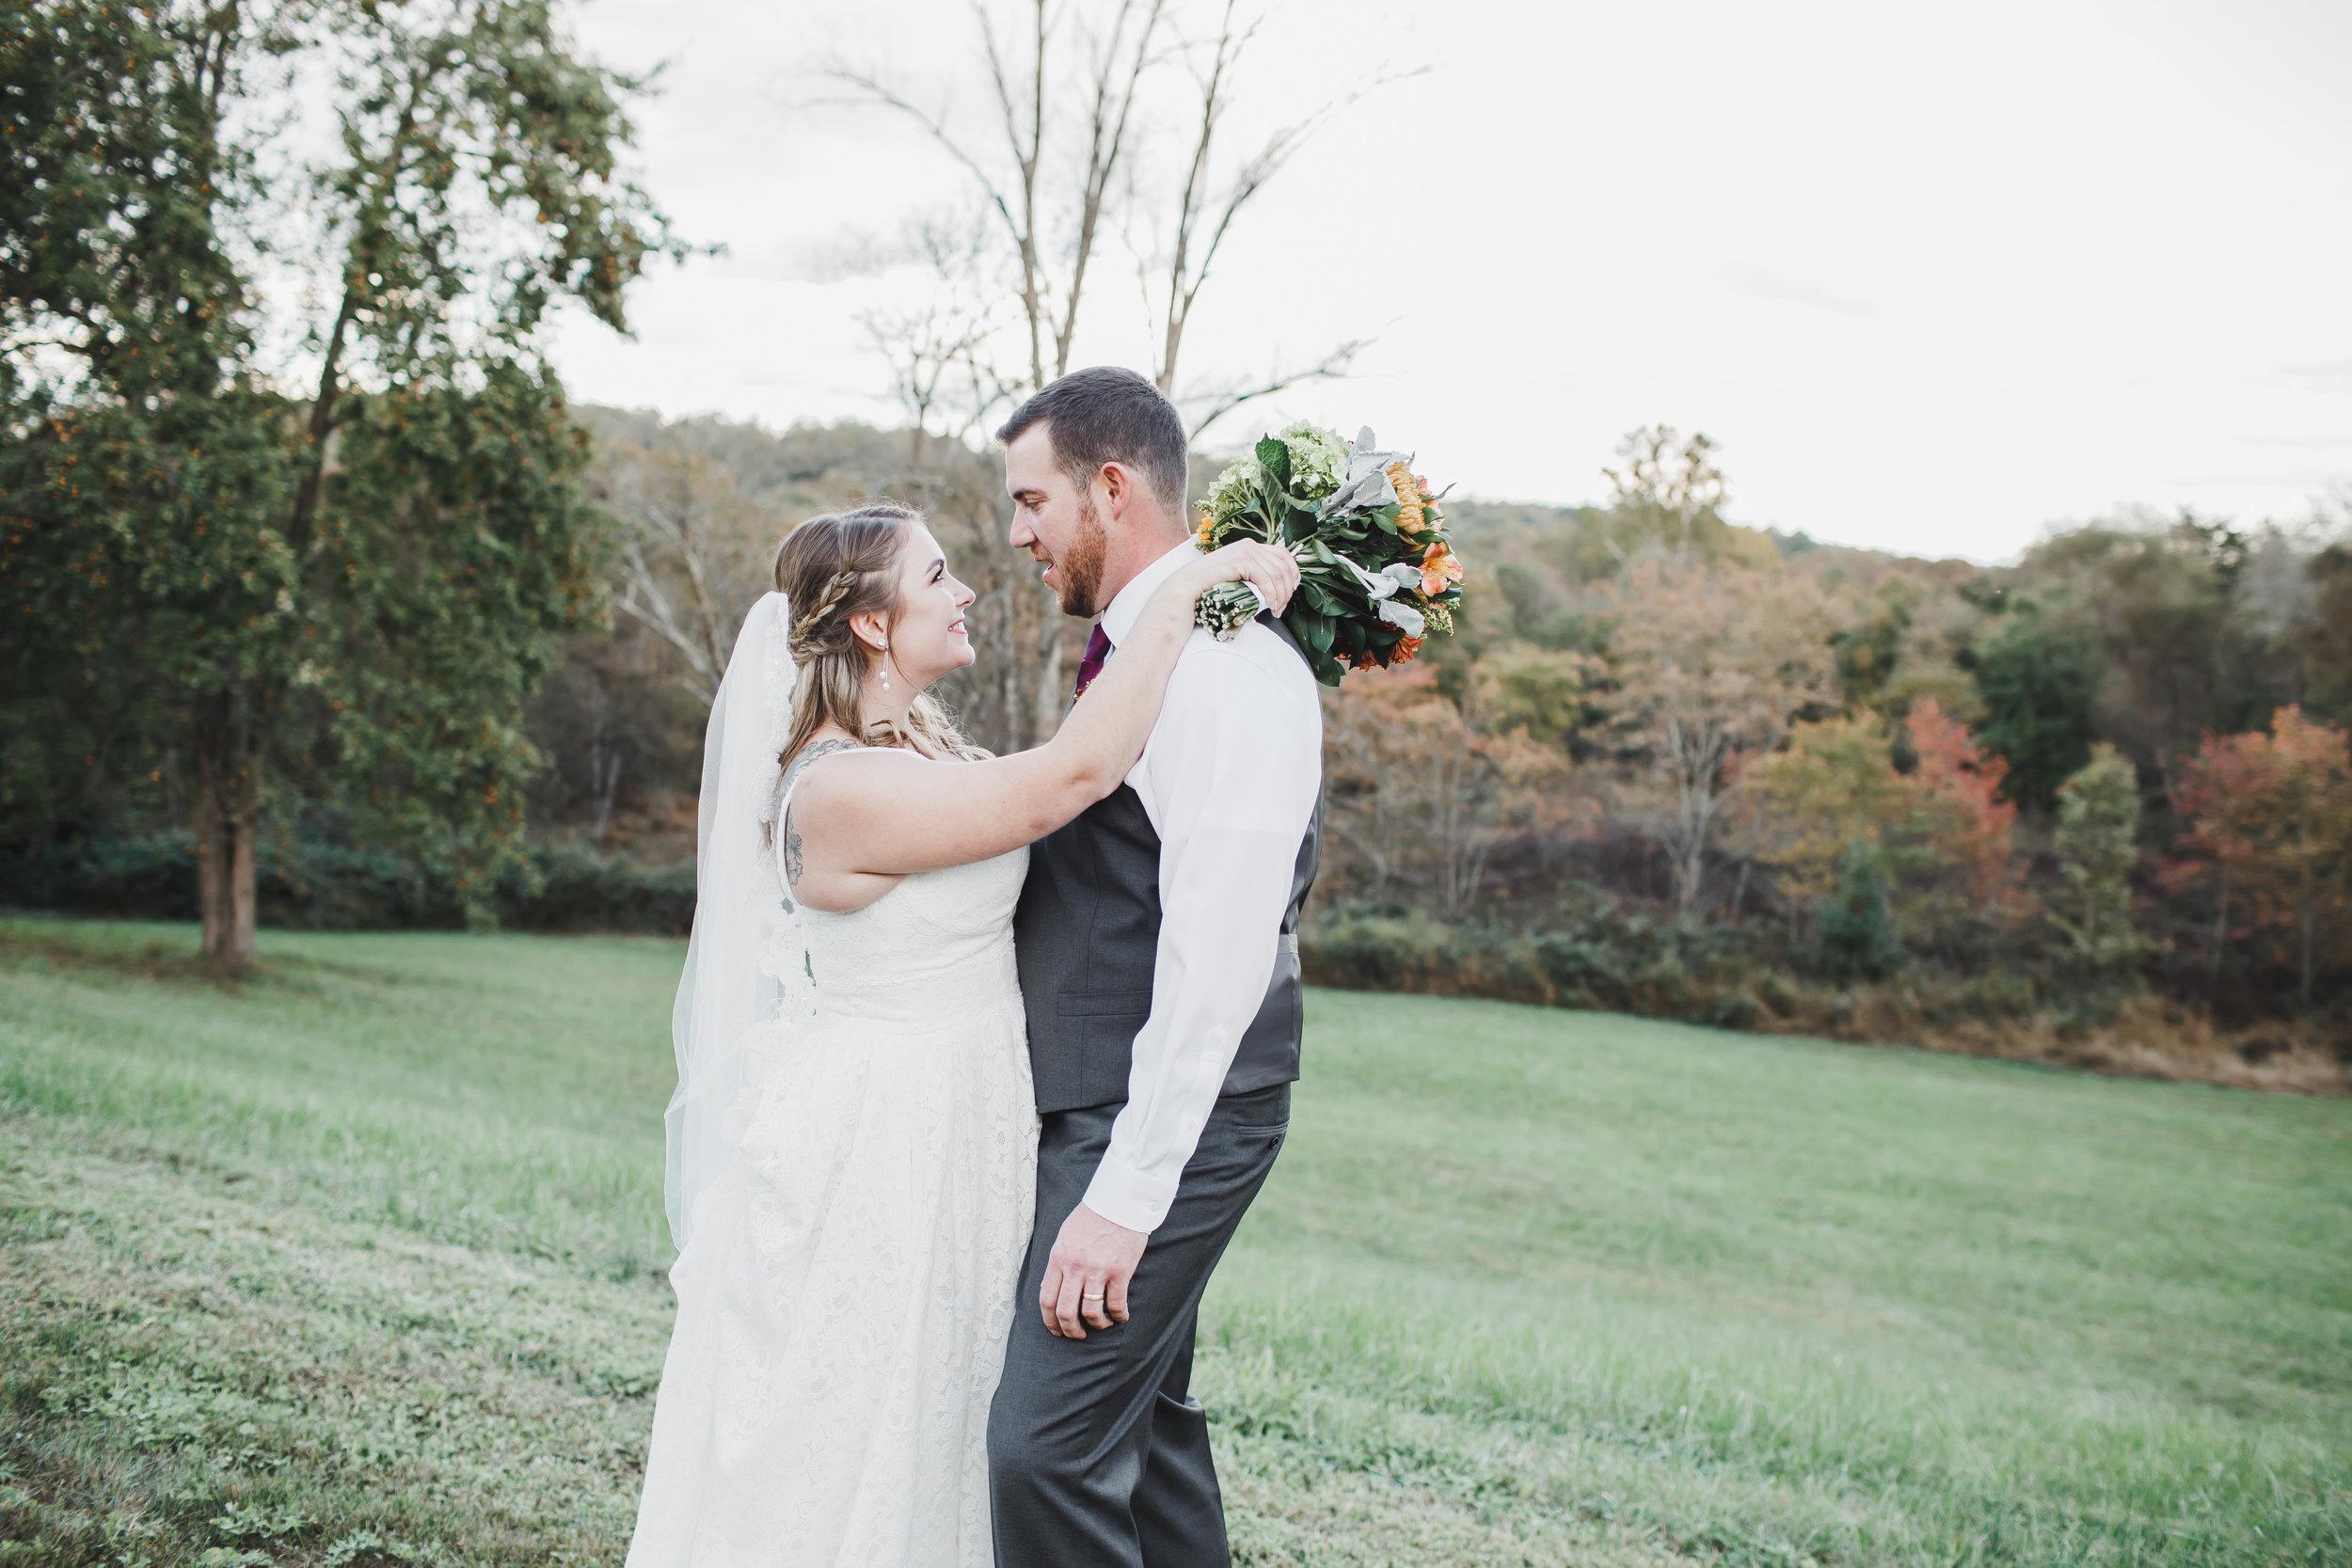 Fling - Virginia Wedding Photographer - Photography by Amy Nicole-4582-2.jpg